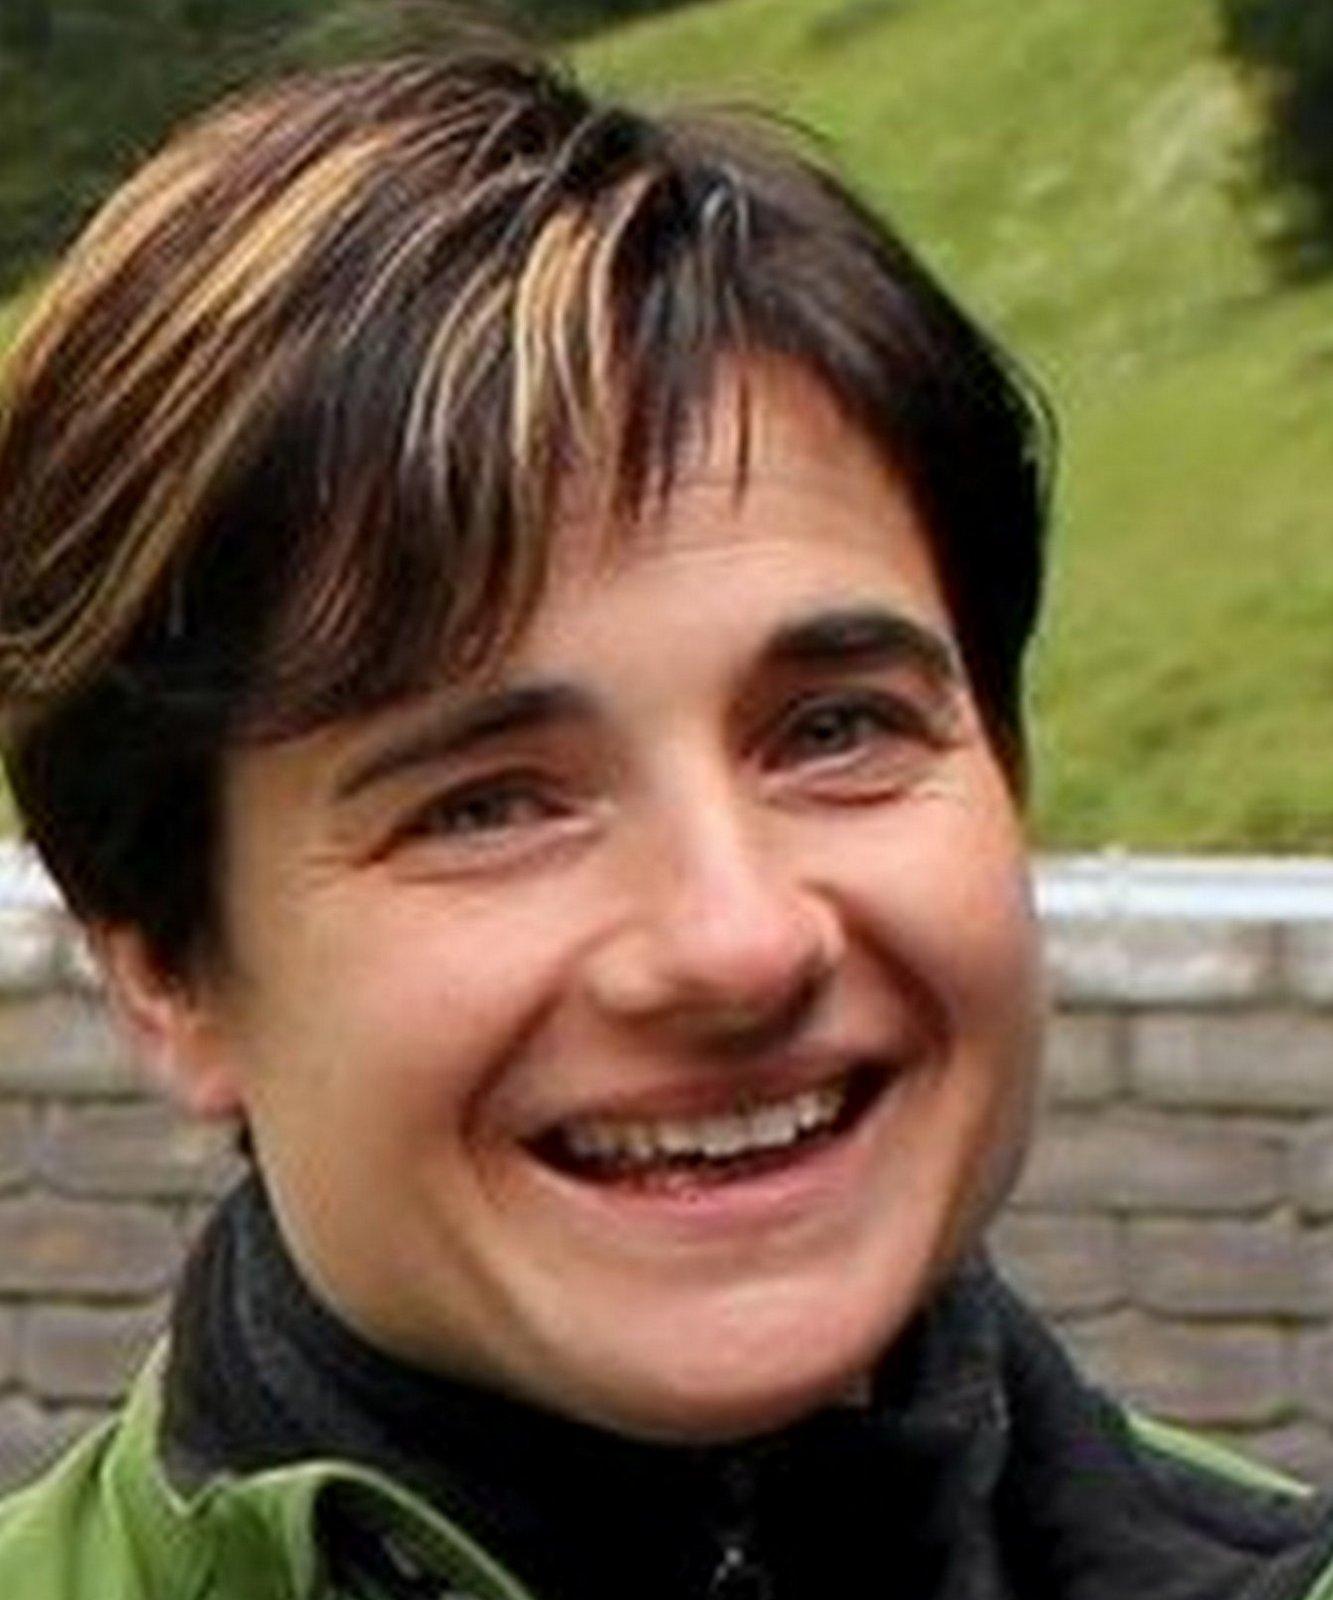 Michaela Schuberth